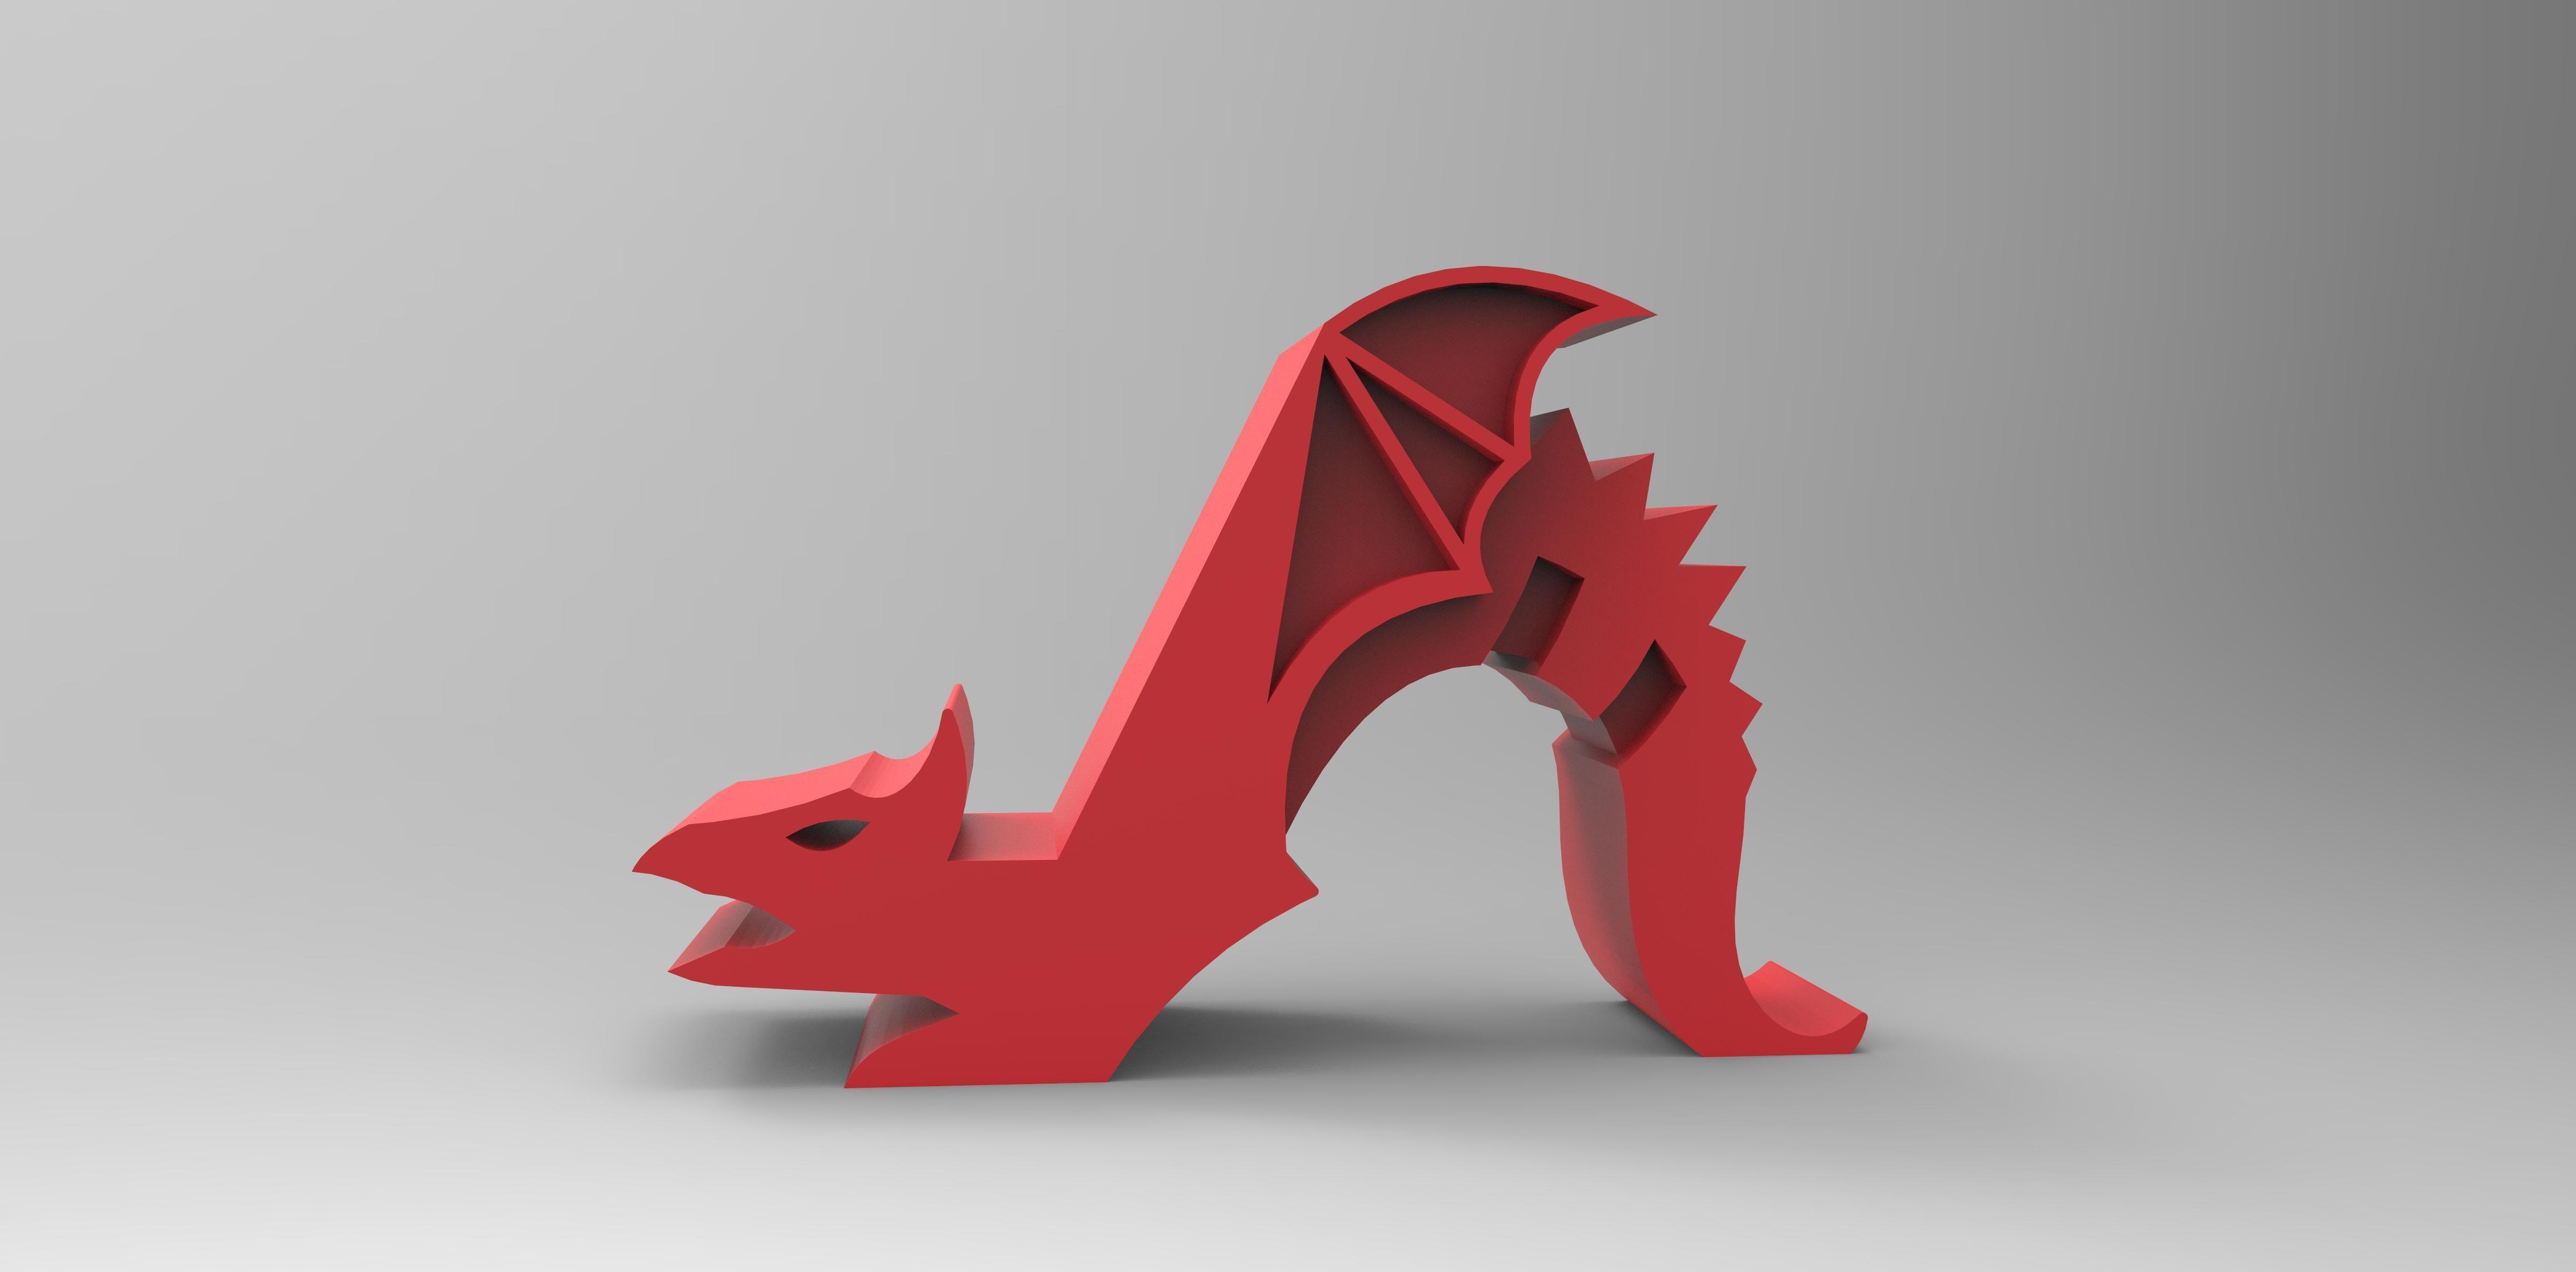 Dragon Phone holder 3D Model 3D printable STL  CGTradercom